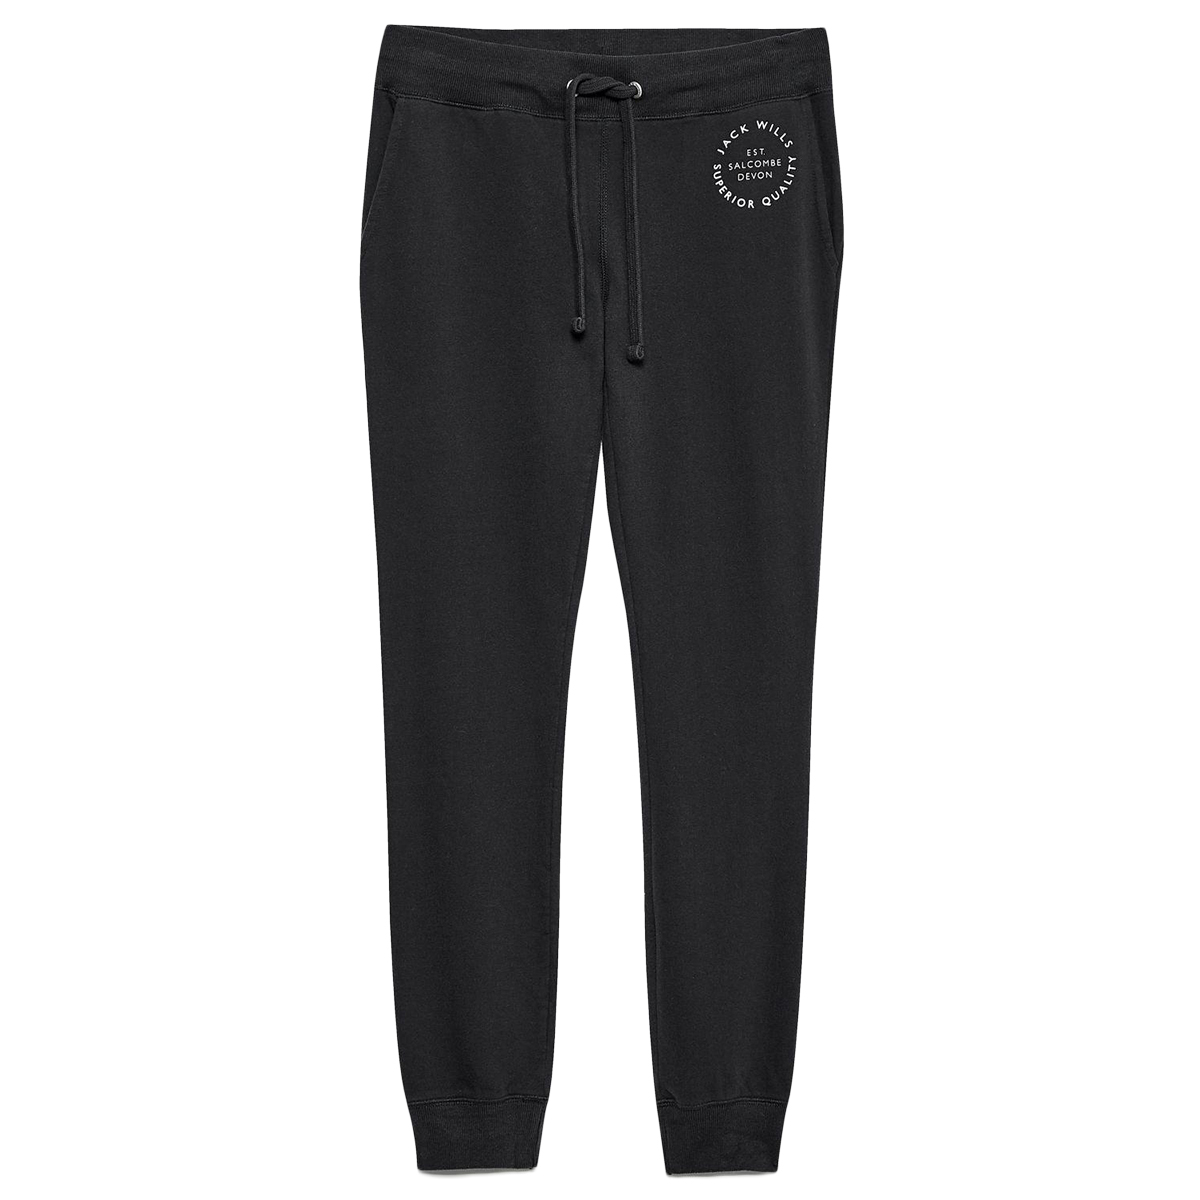 Jack Wills Women's Bakershill Slim Jogging Bottoms - Black, 4